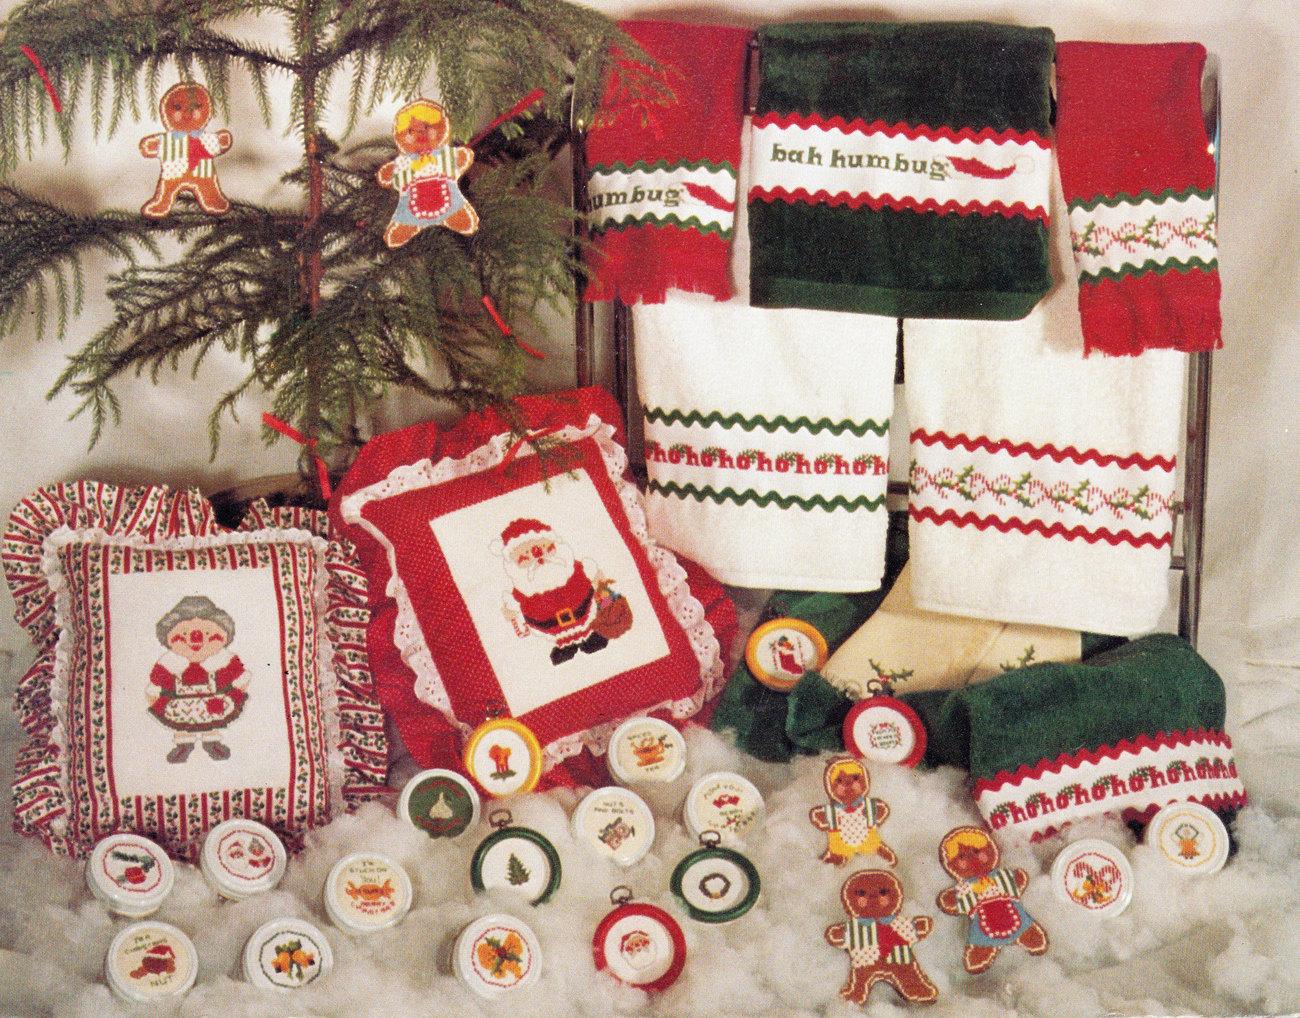 CROSS STITCH CHRISTMAS CREATIONS BY JUDY GIBBS - $3.75